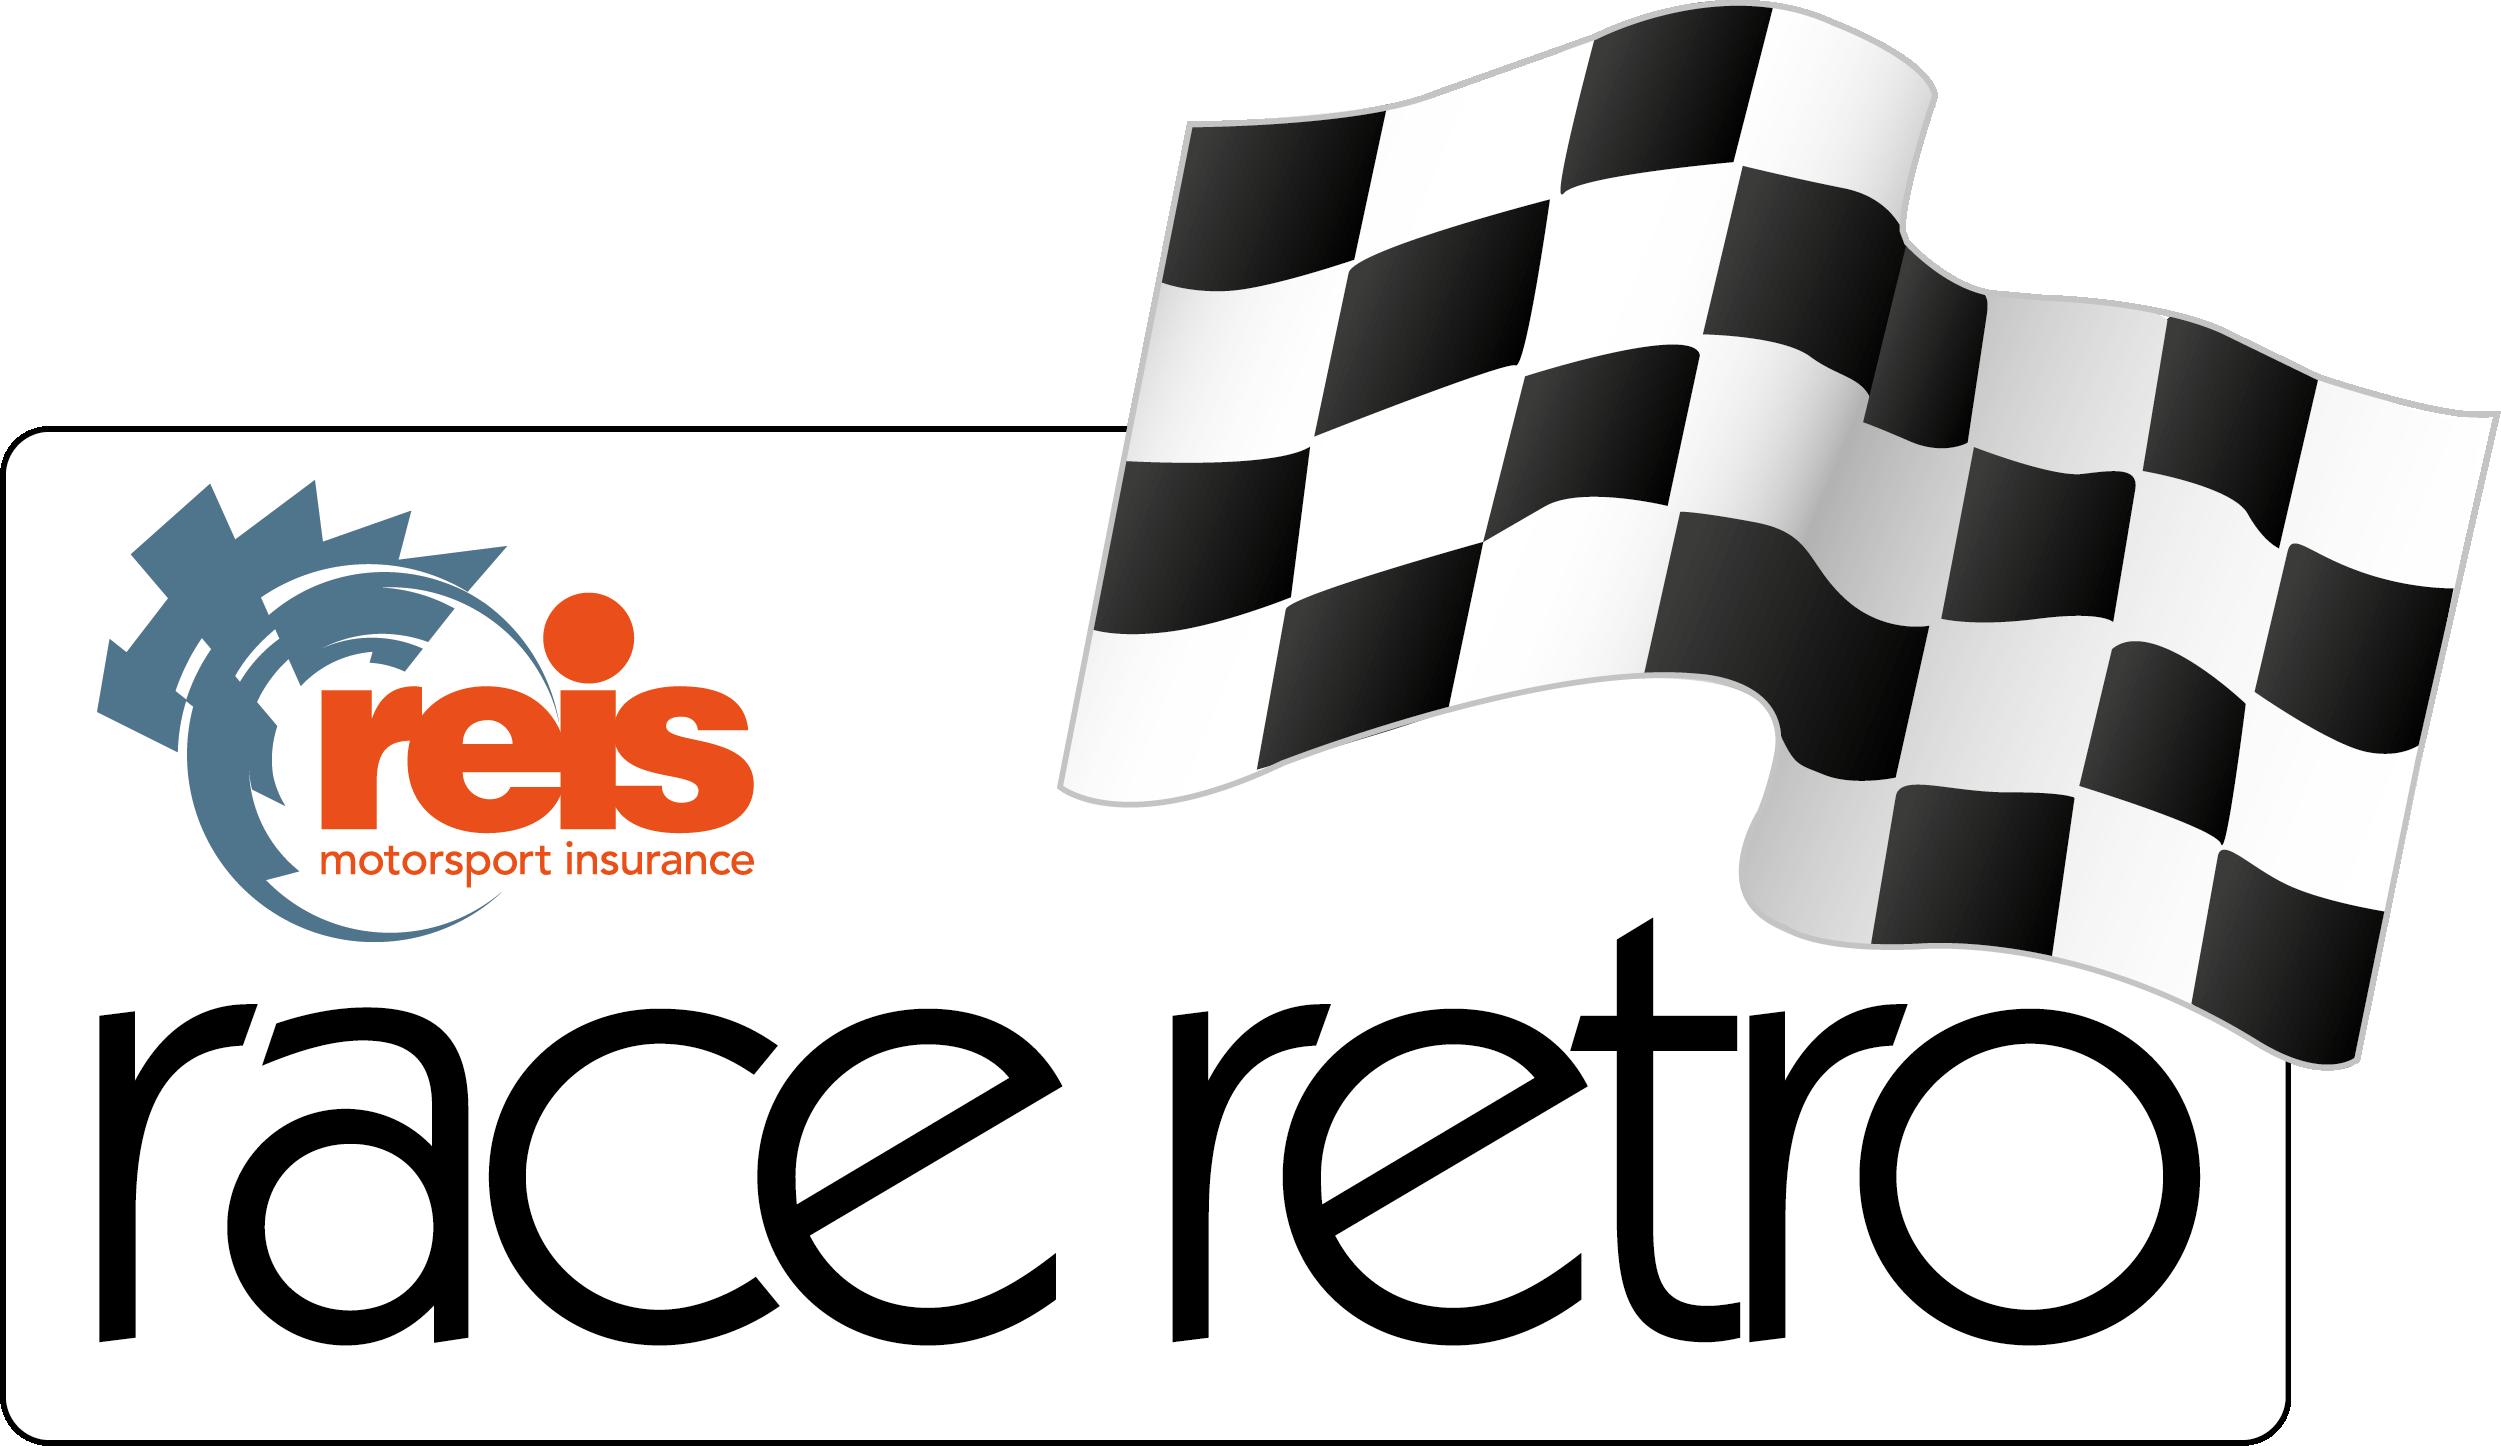 Reis Race Retro logo with chequered flag